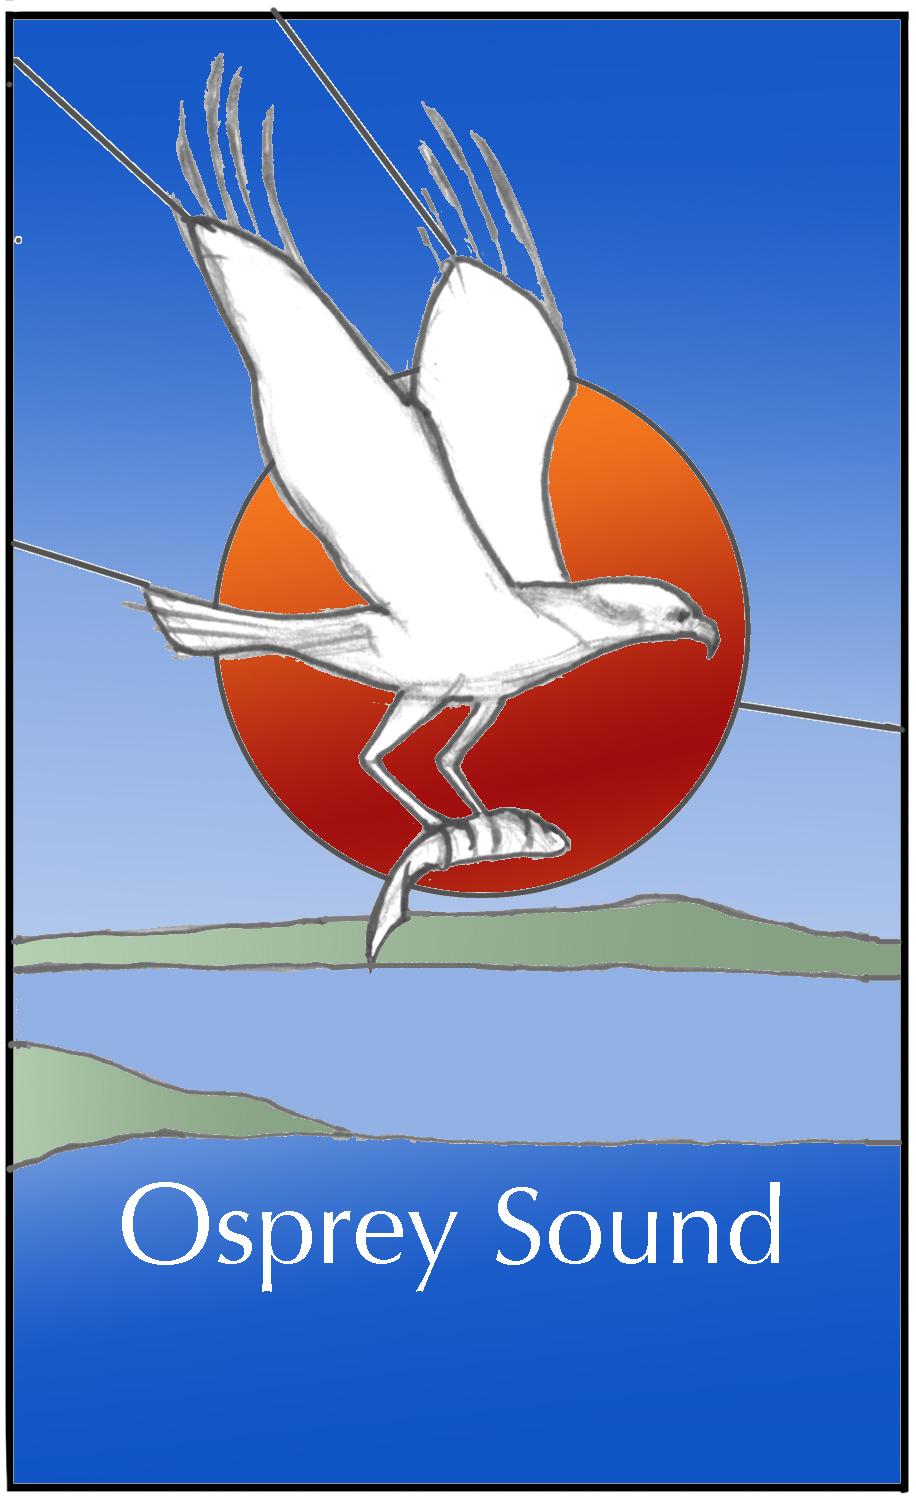 Osprey Sound sign.jpg